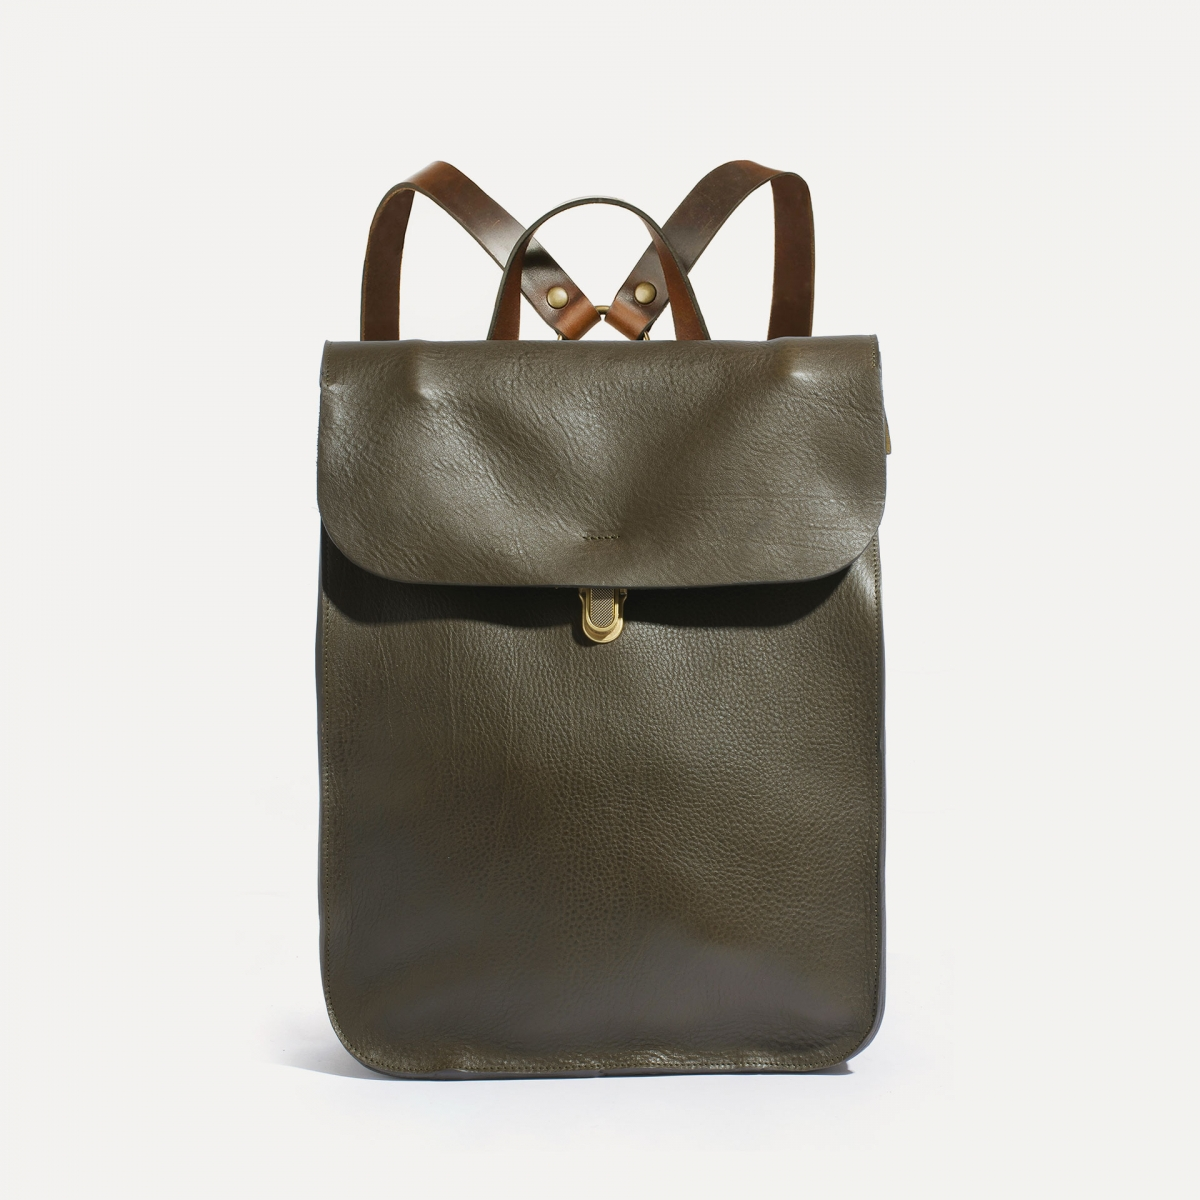 Puncho leather backpack - Khaki / E Pure (image n°1)